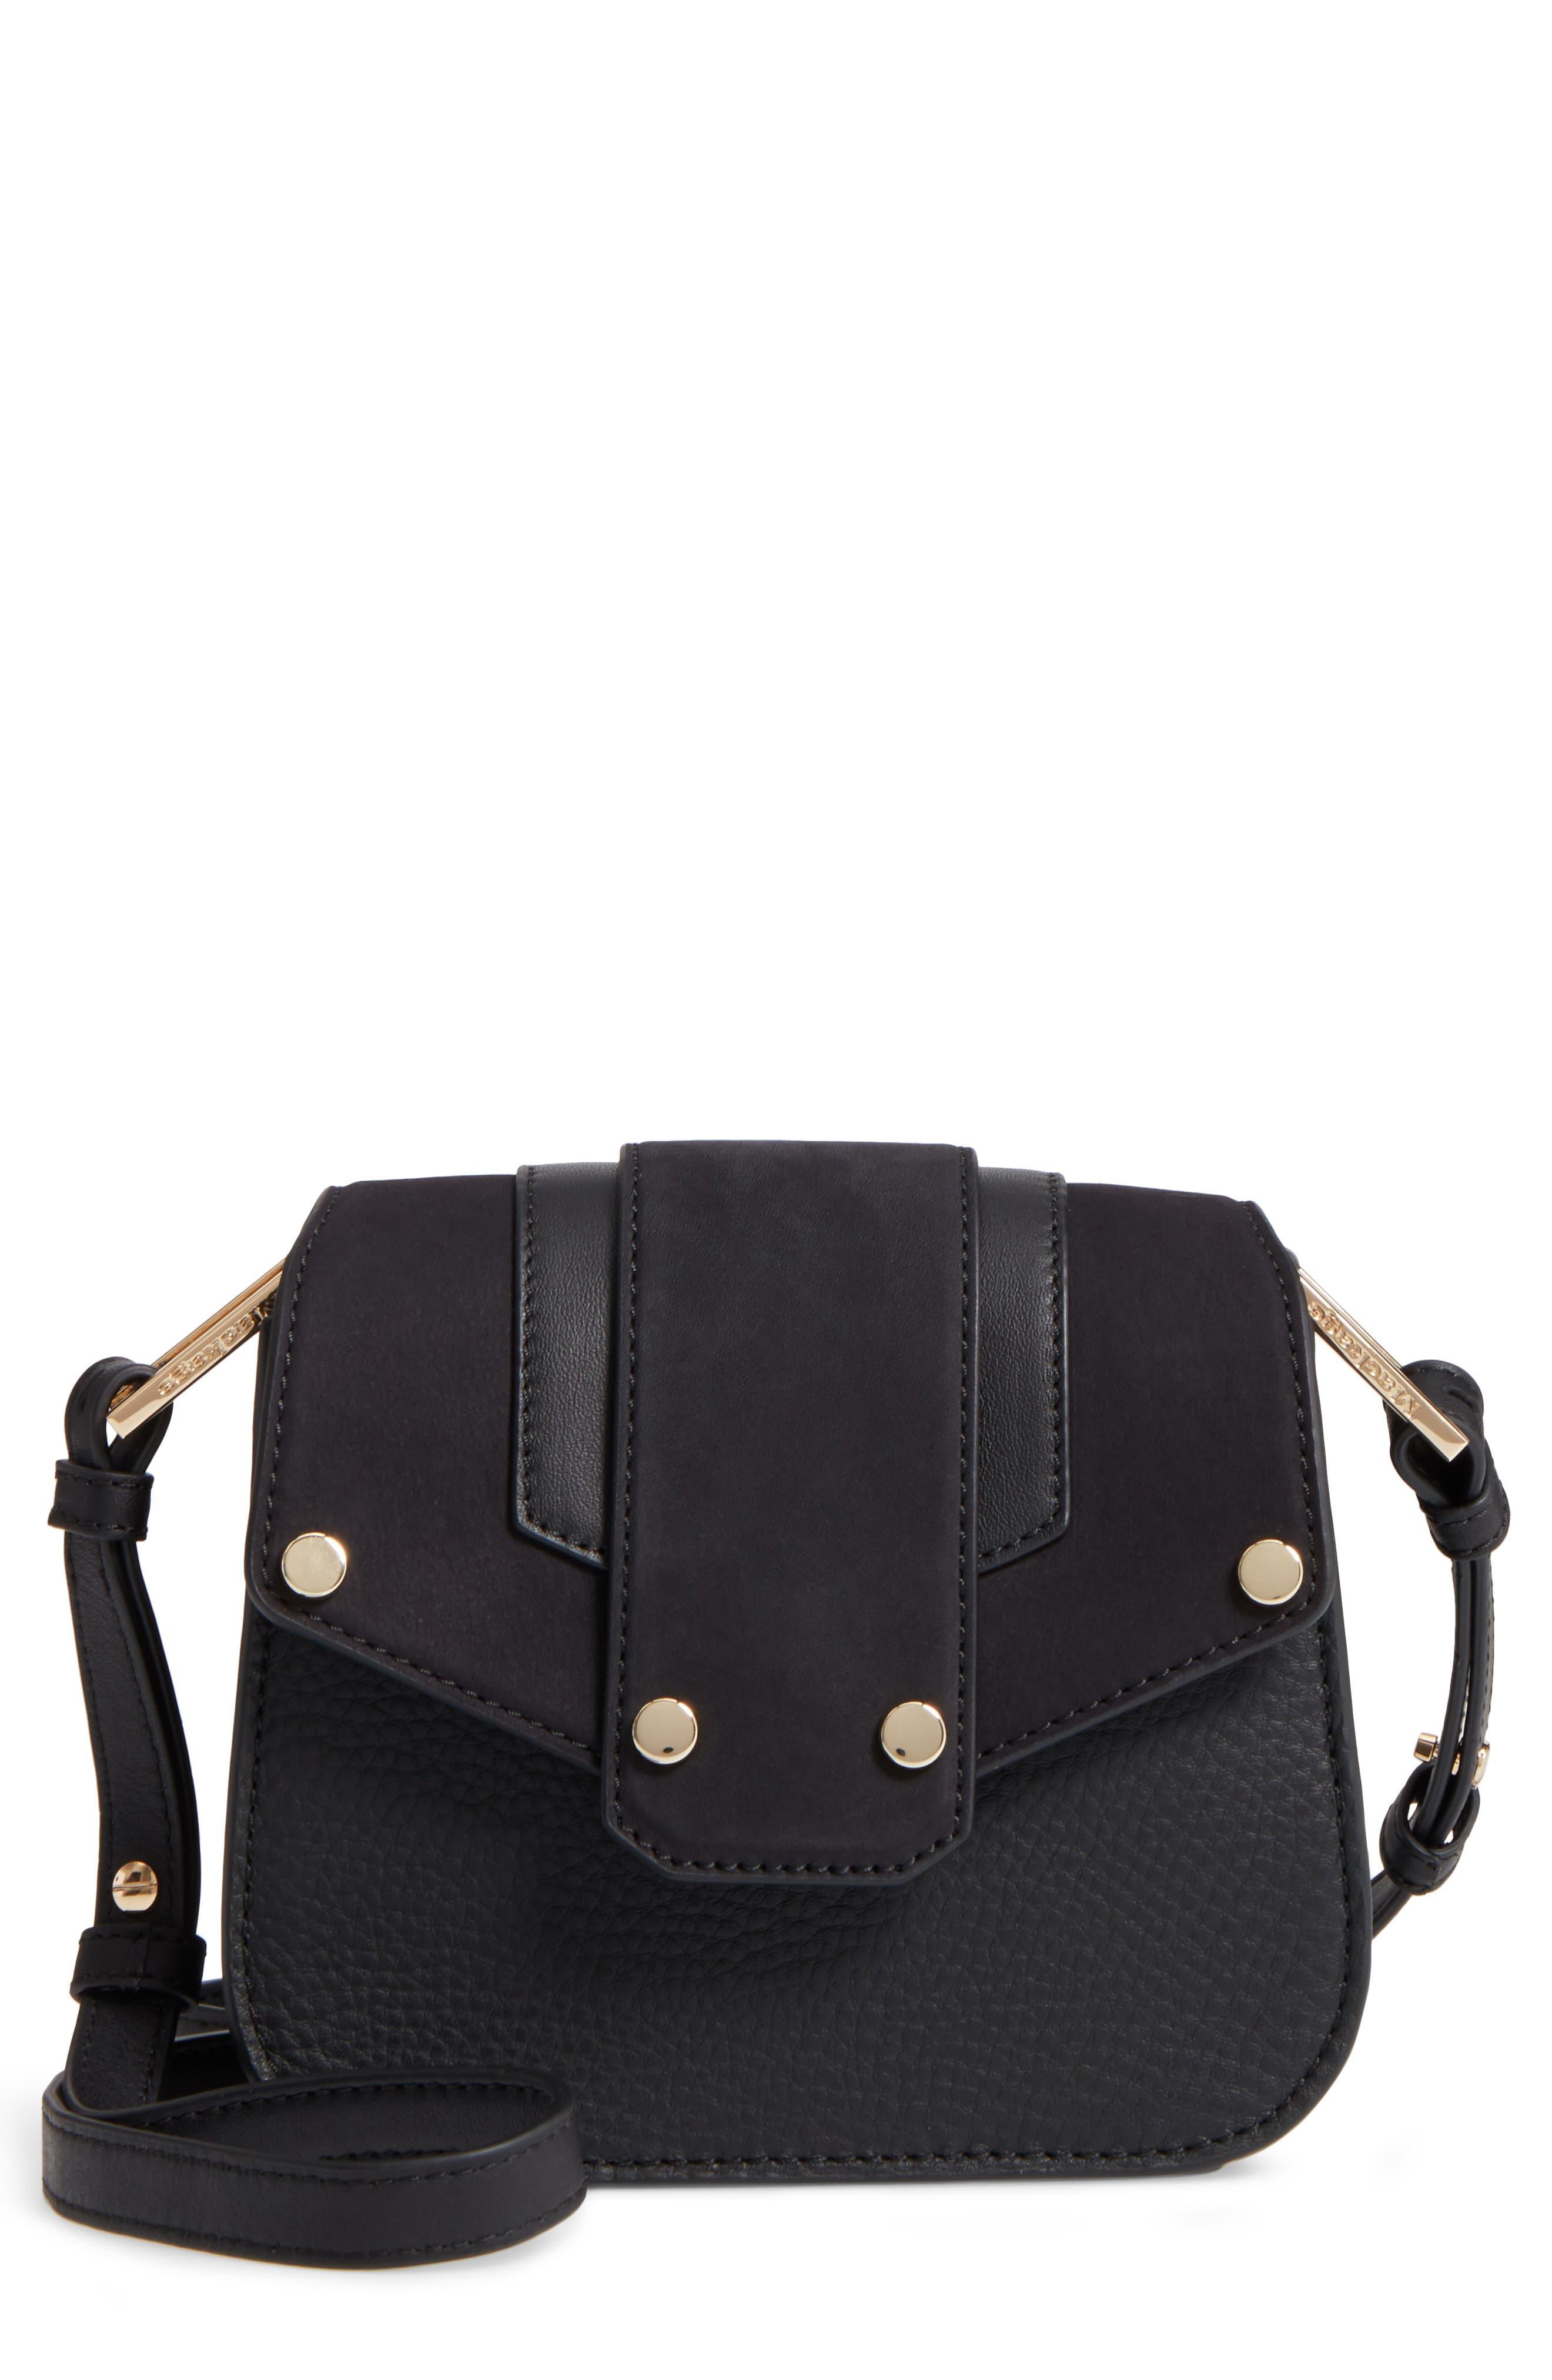 Mackage Mini Polly Leather Crossbody Bag